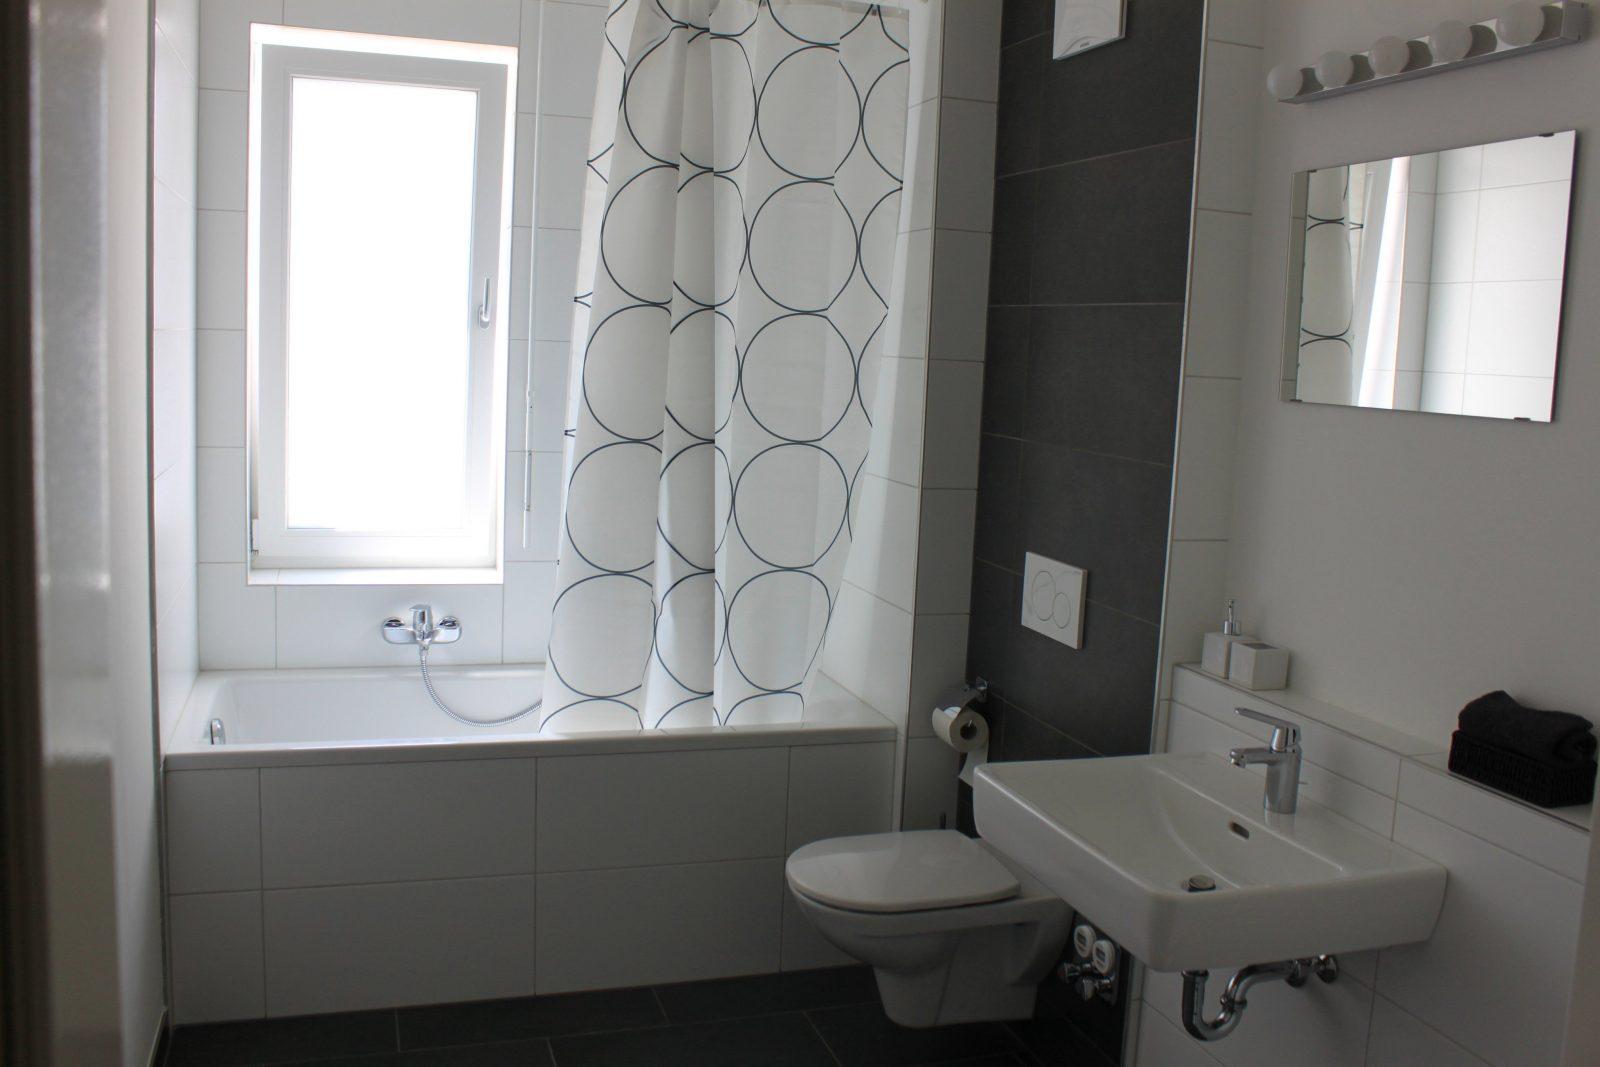 Dusche Vorm Fenster L 246 Sung Haus Design Ideen